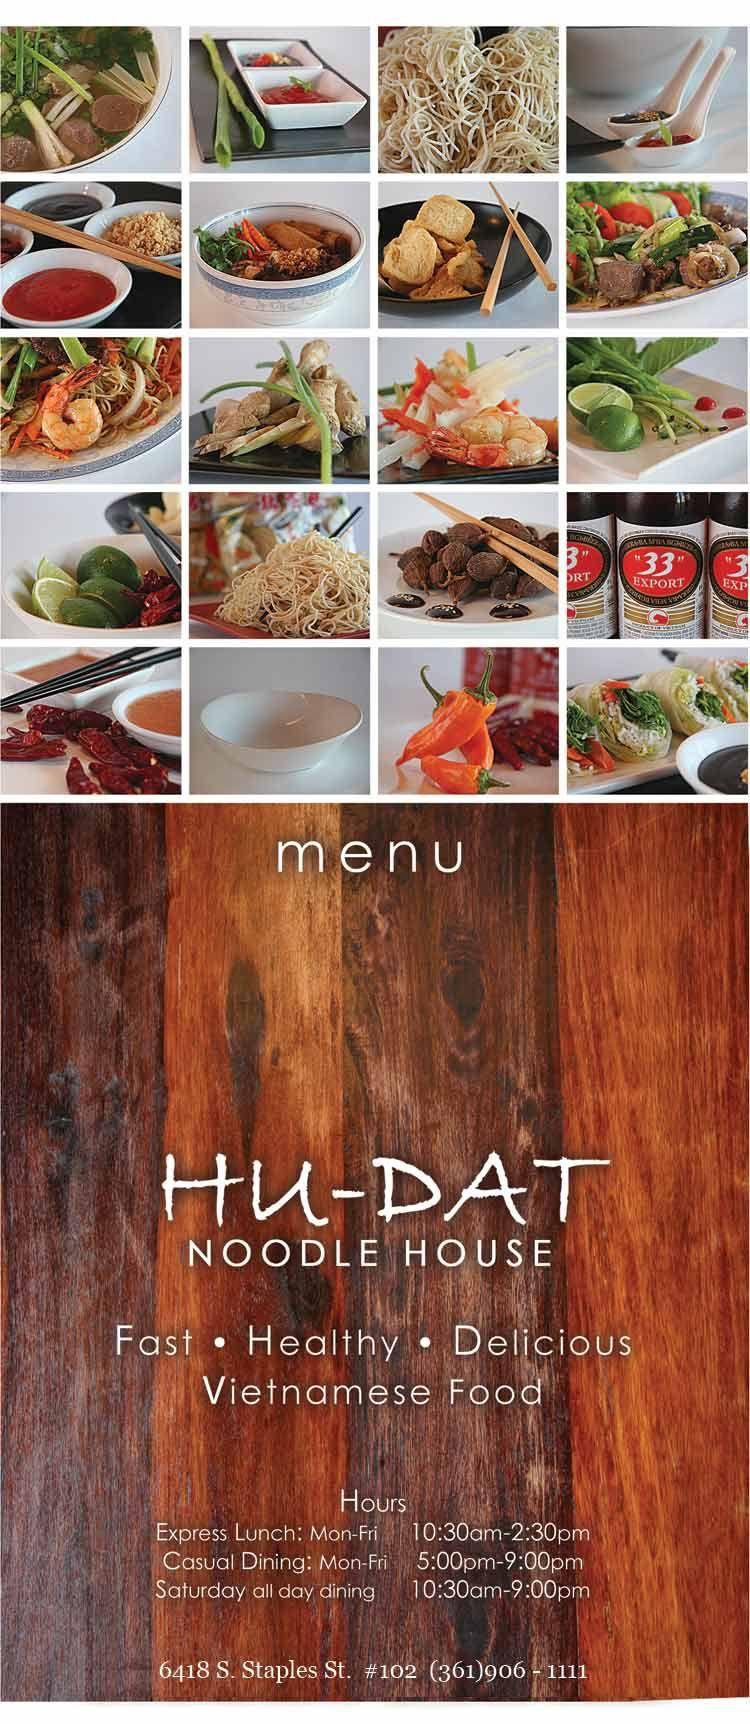 Hu Dat Noodle House Corpus Christi Restaurant Coastal Bend Menu Guide